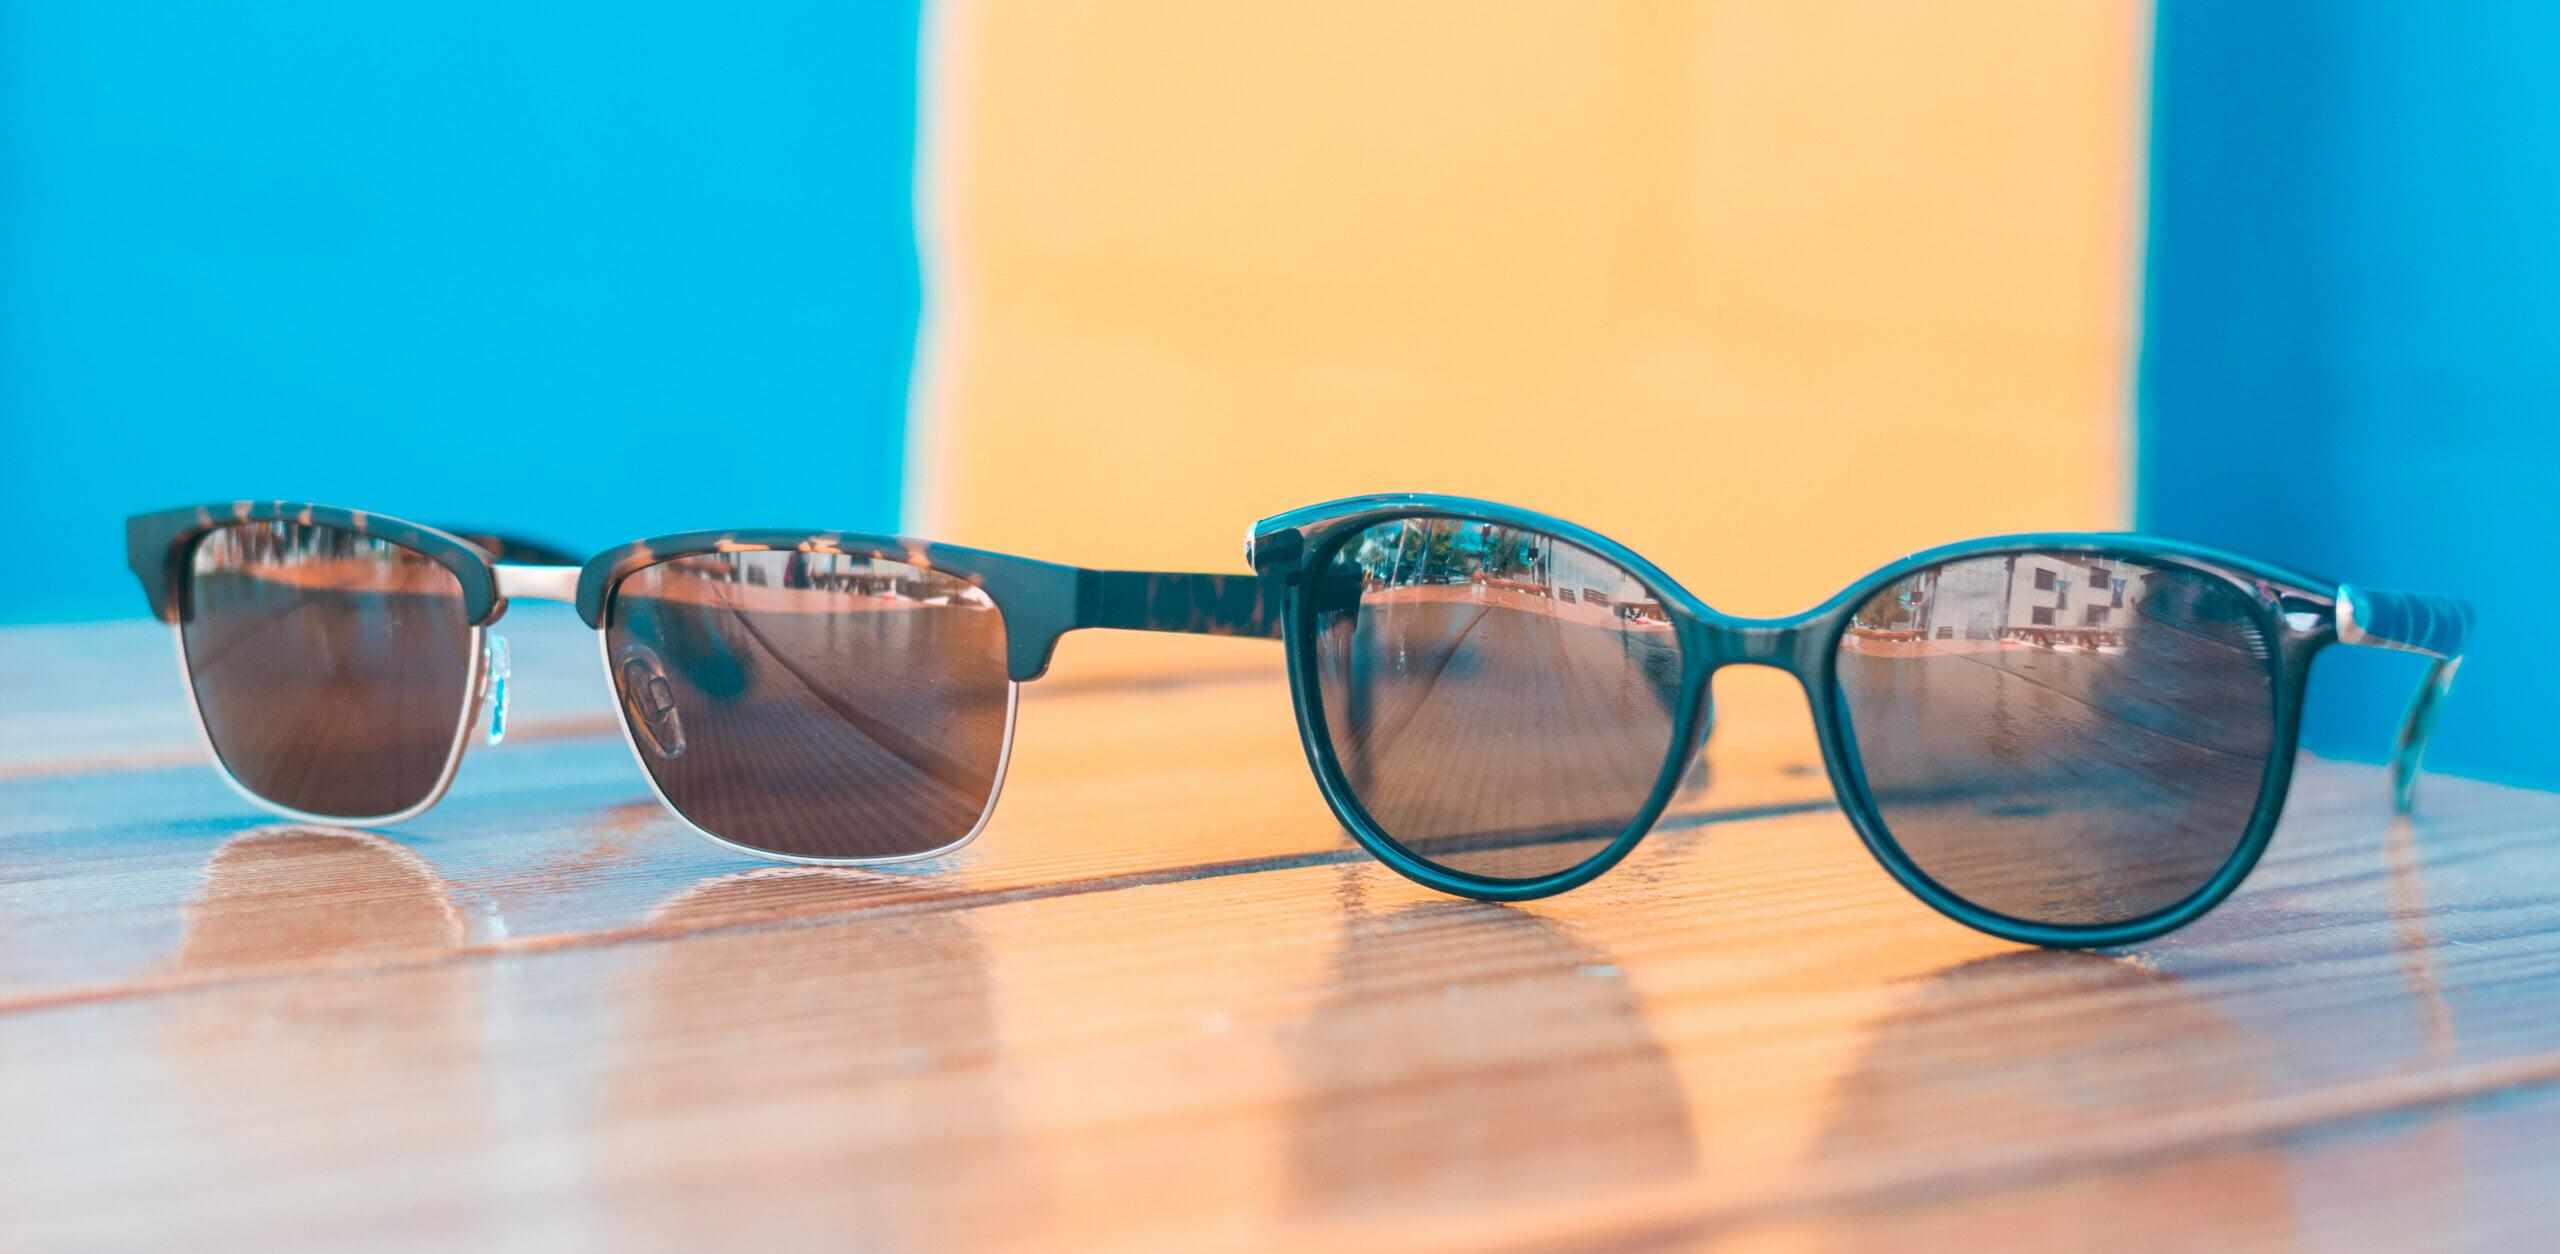 Benefits of Purifier™ Polarized Sunglasses